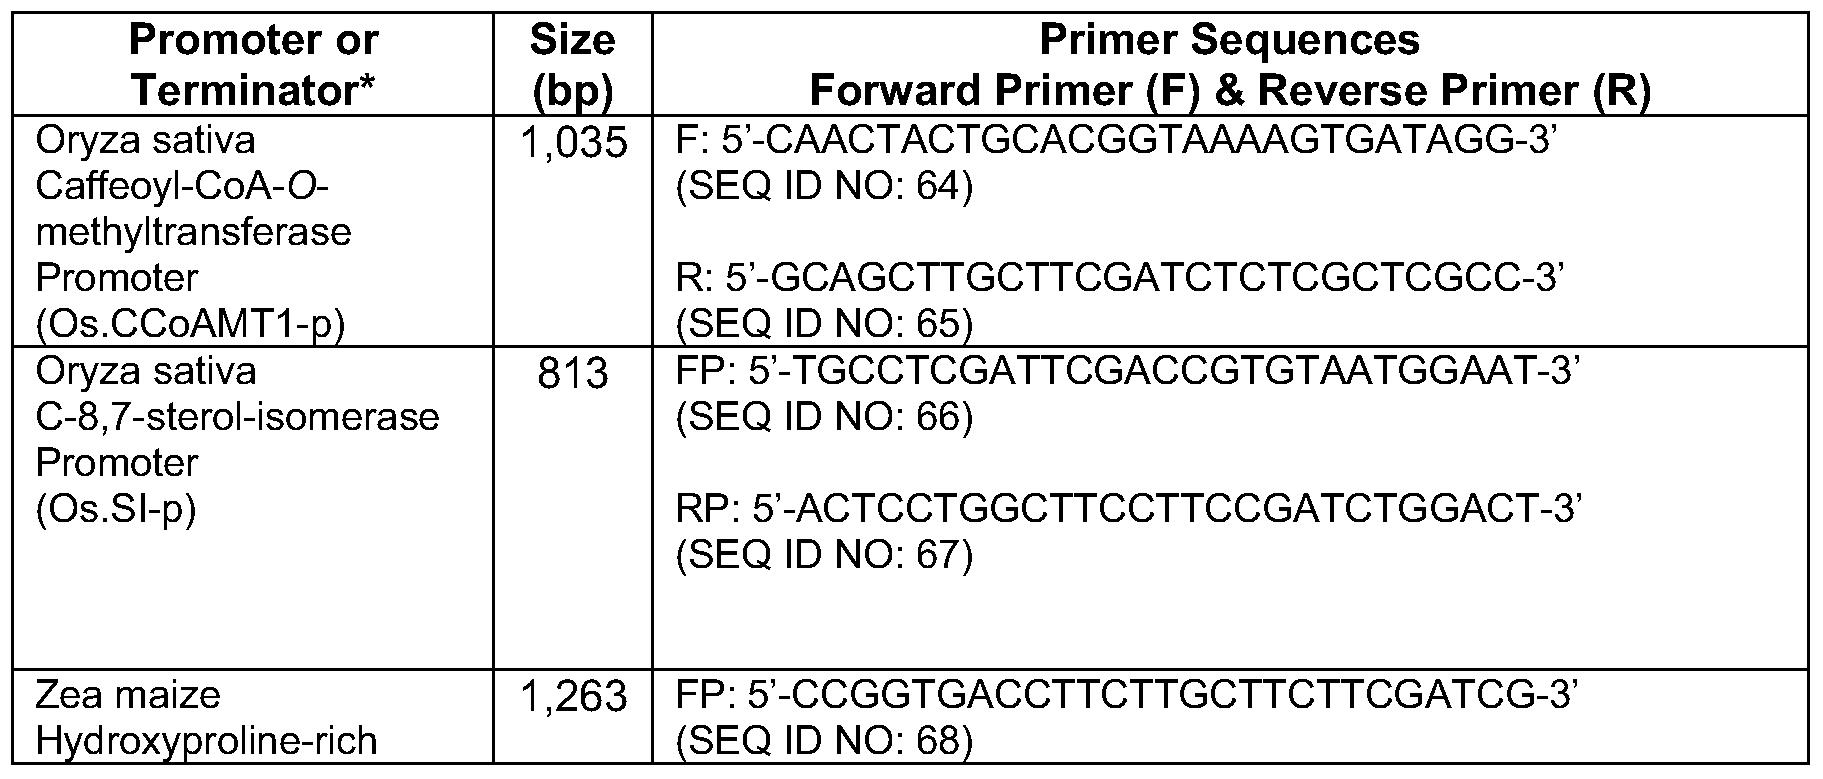 brevetto wo2006111512a1 improved methods controlling gene expression google brevetti. Black Bedroom Furniture Sets. Home Design Ideas